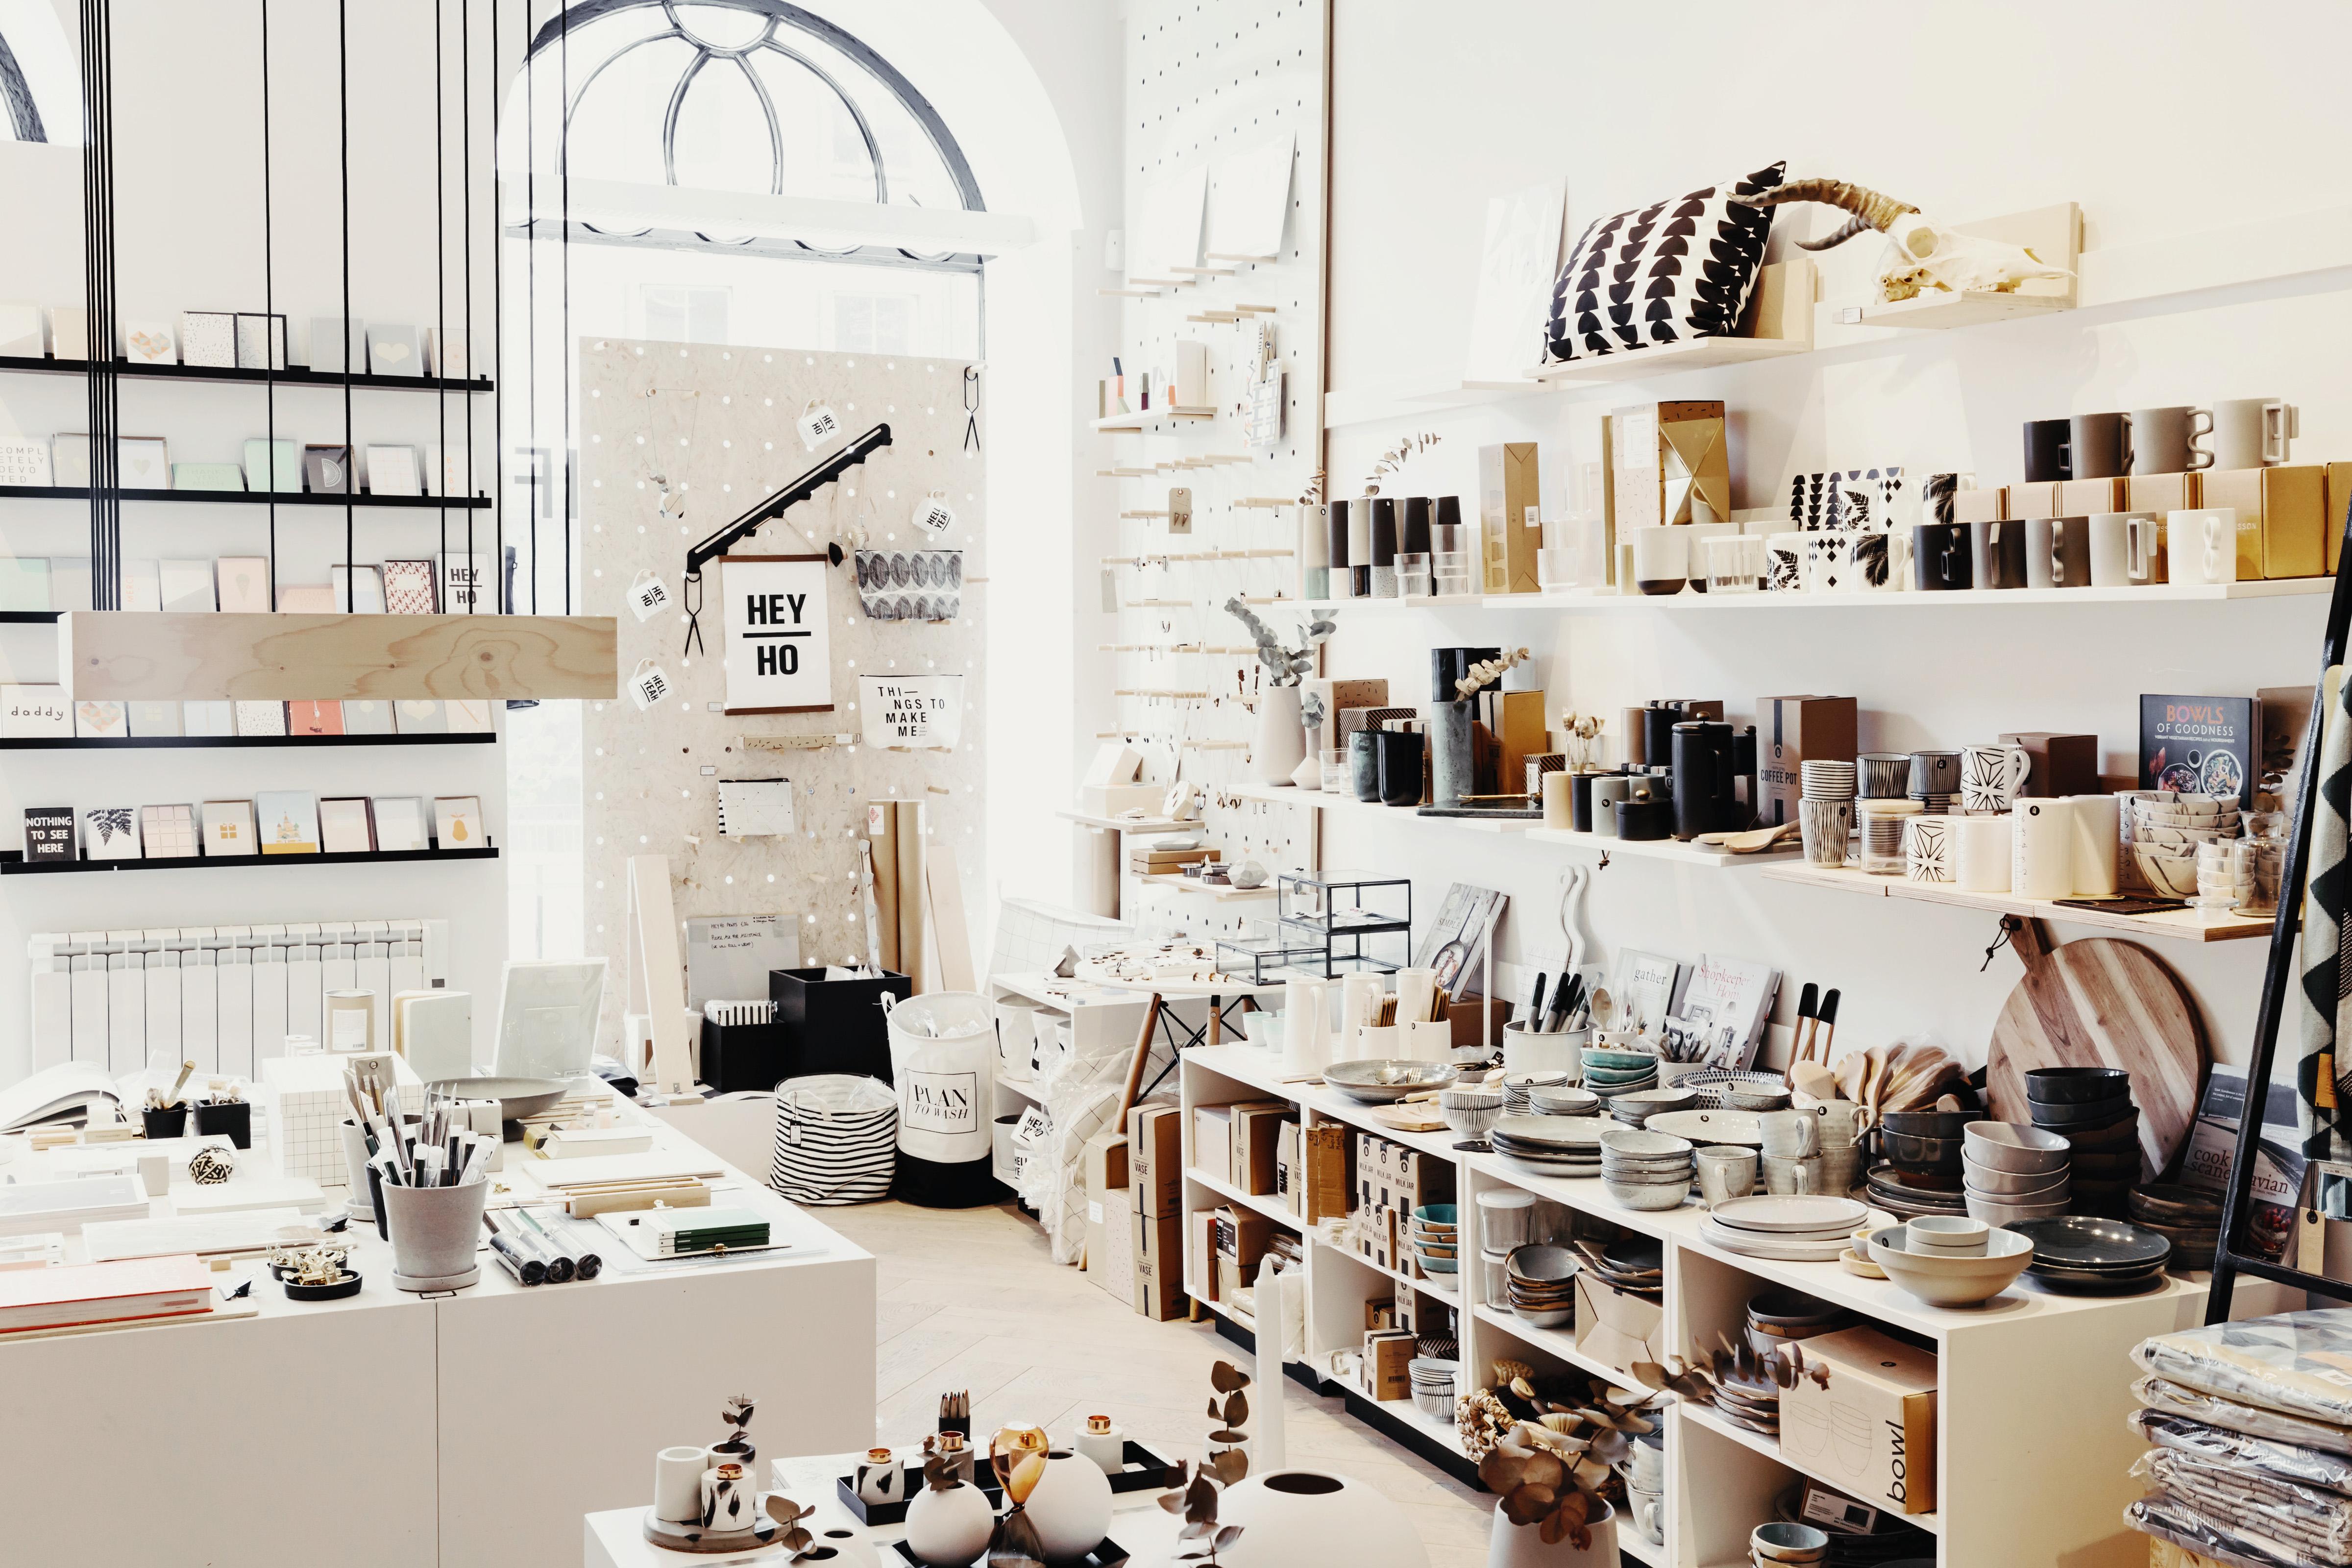 Independent interior and design shop in Edinburgh